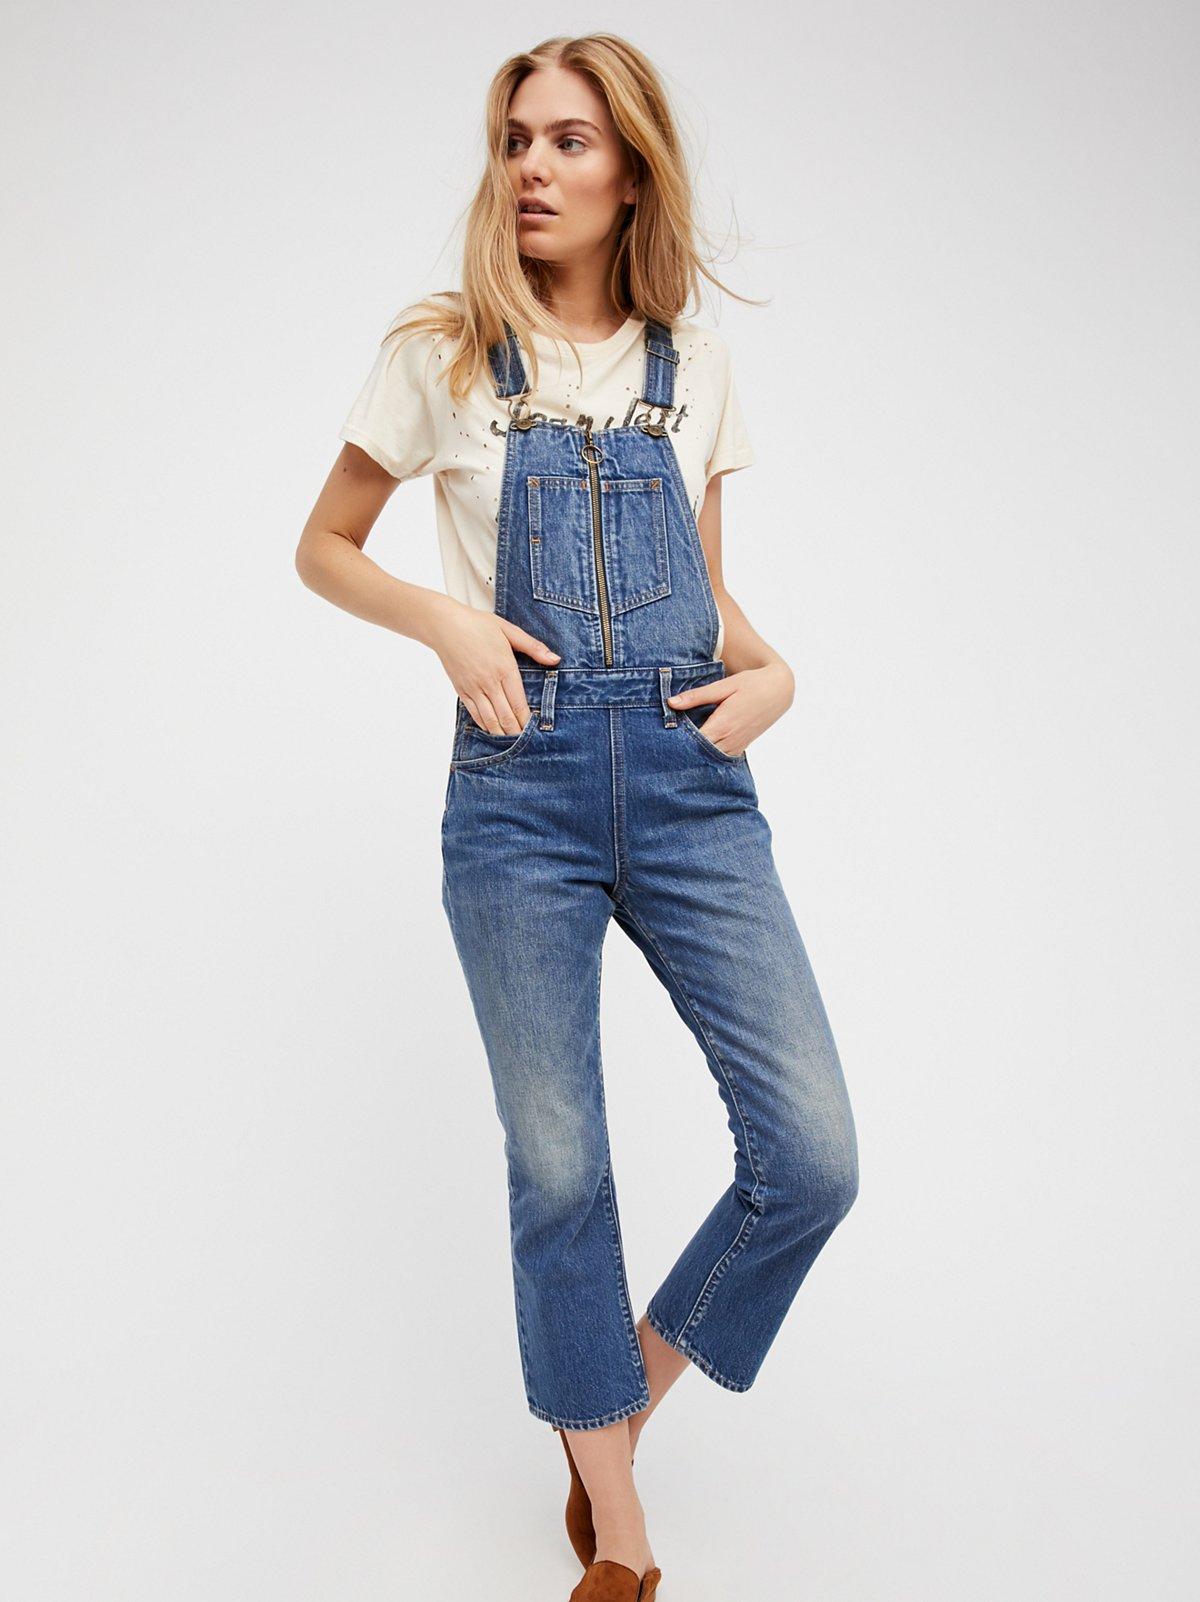 Womens Denim Overall Jeans - Xtellar Jeans